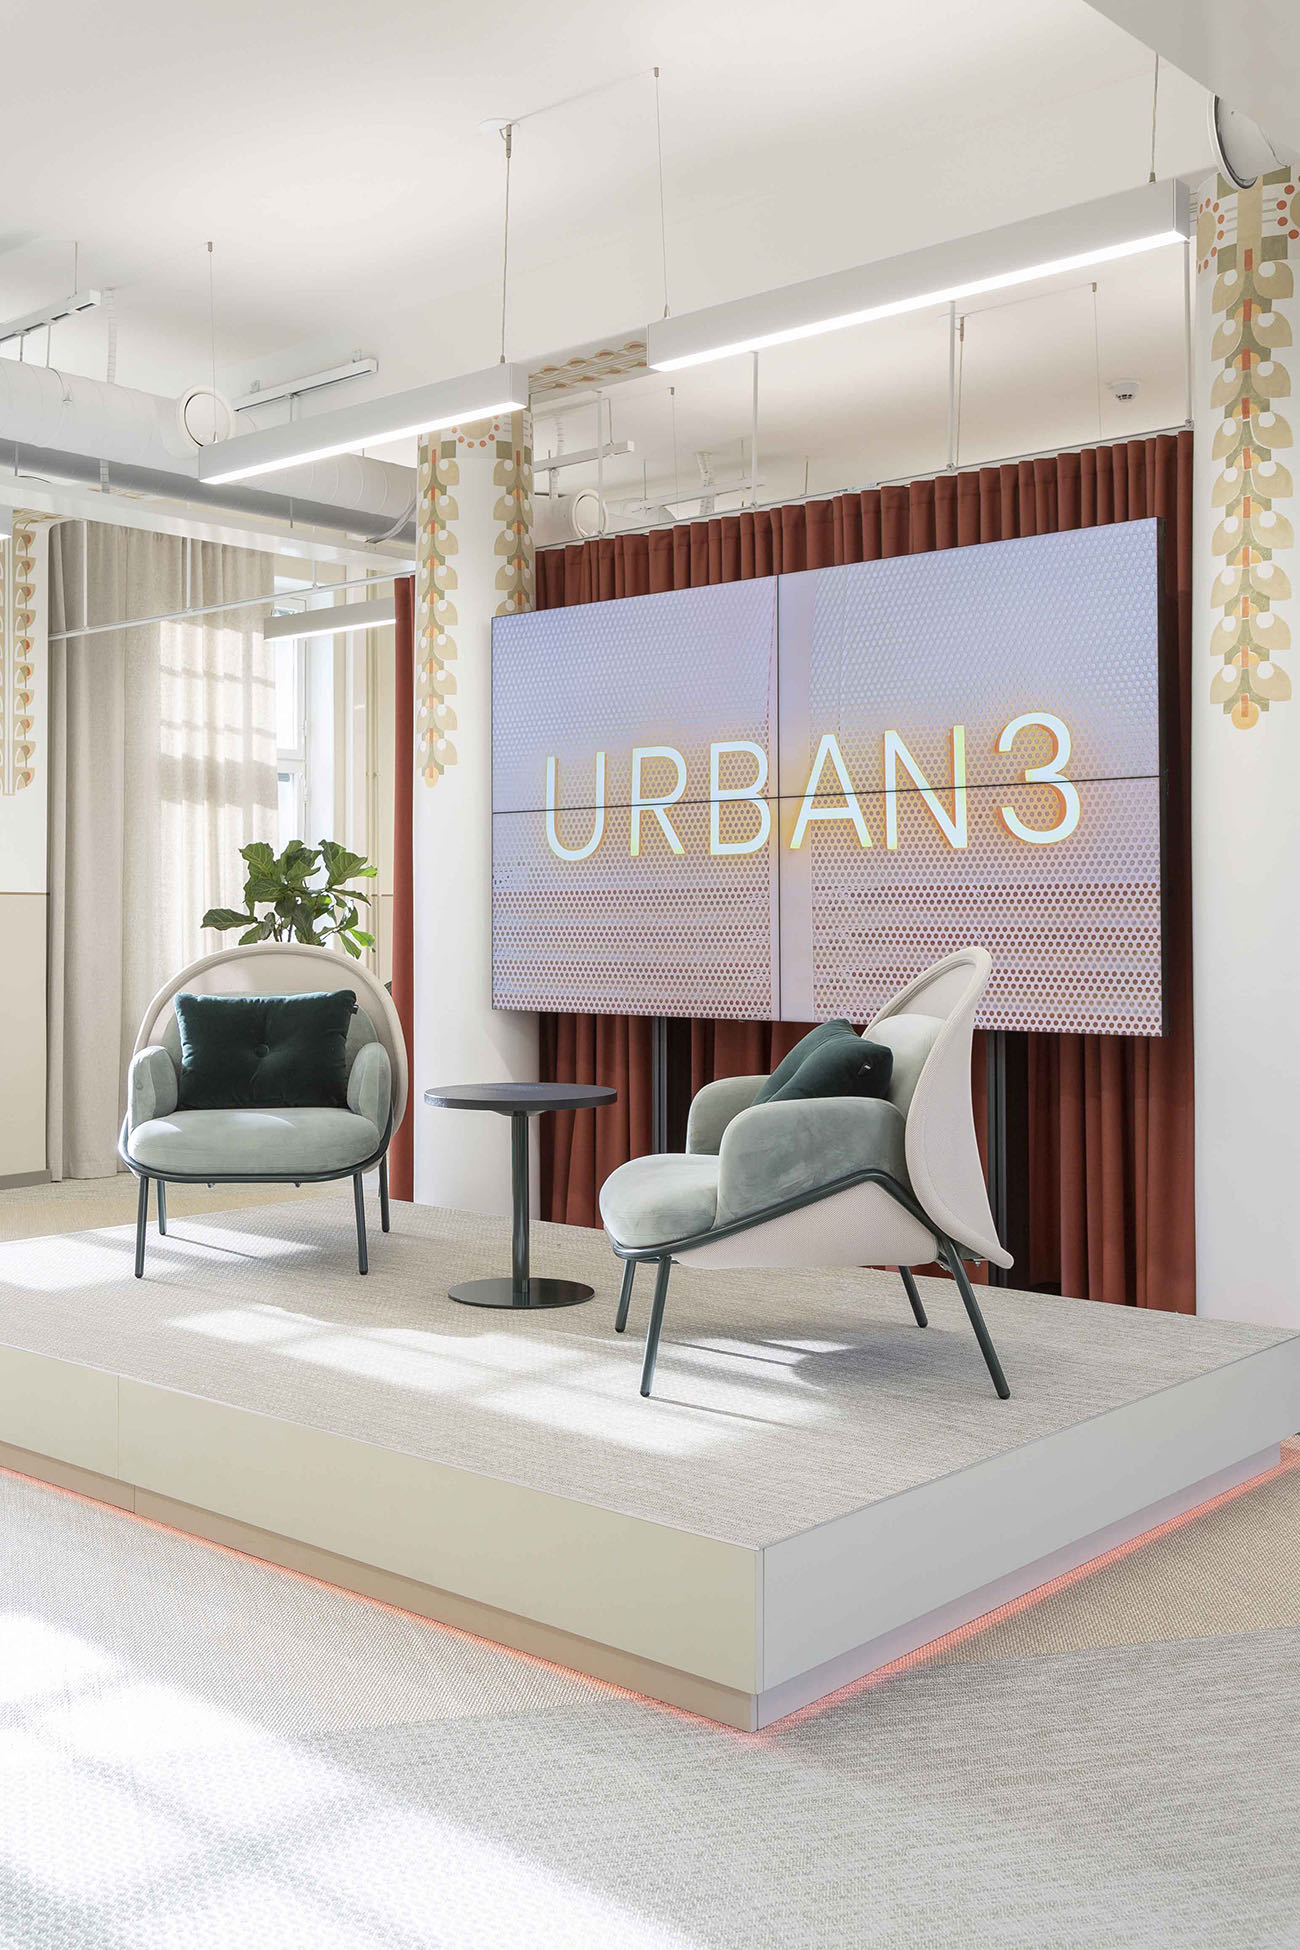 urban3-coworking-helsinki-4